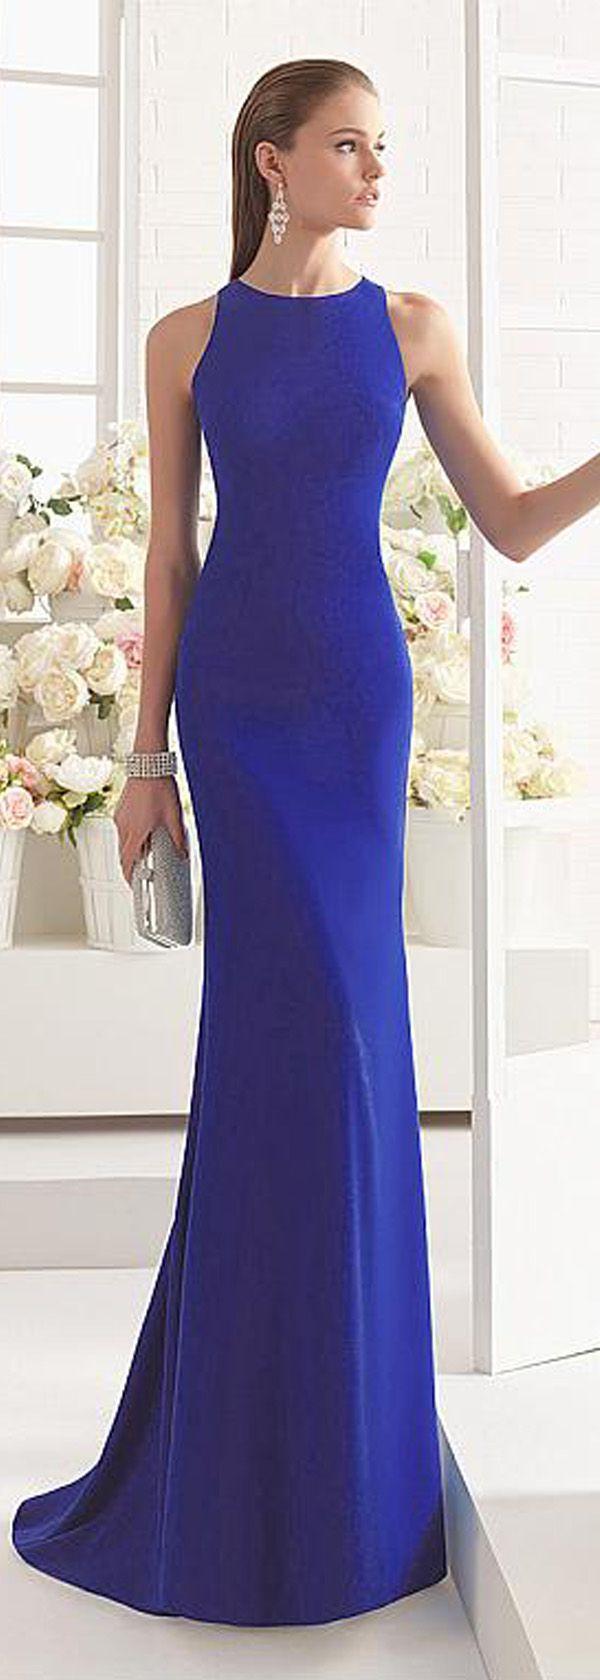 Hot Sale Acetate Satin Jewel Neckline Mermaid Evening Dresses